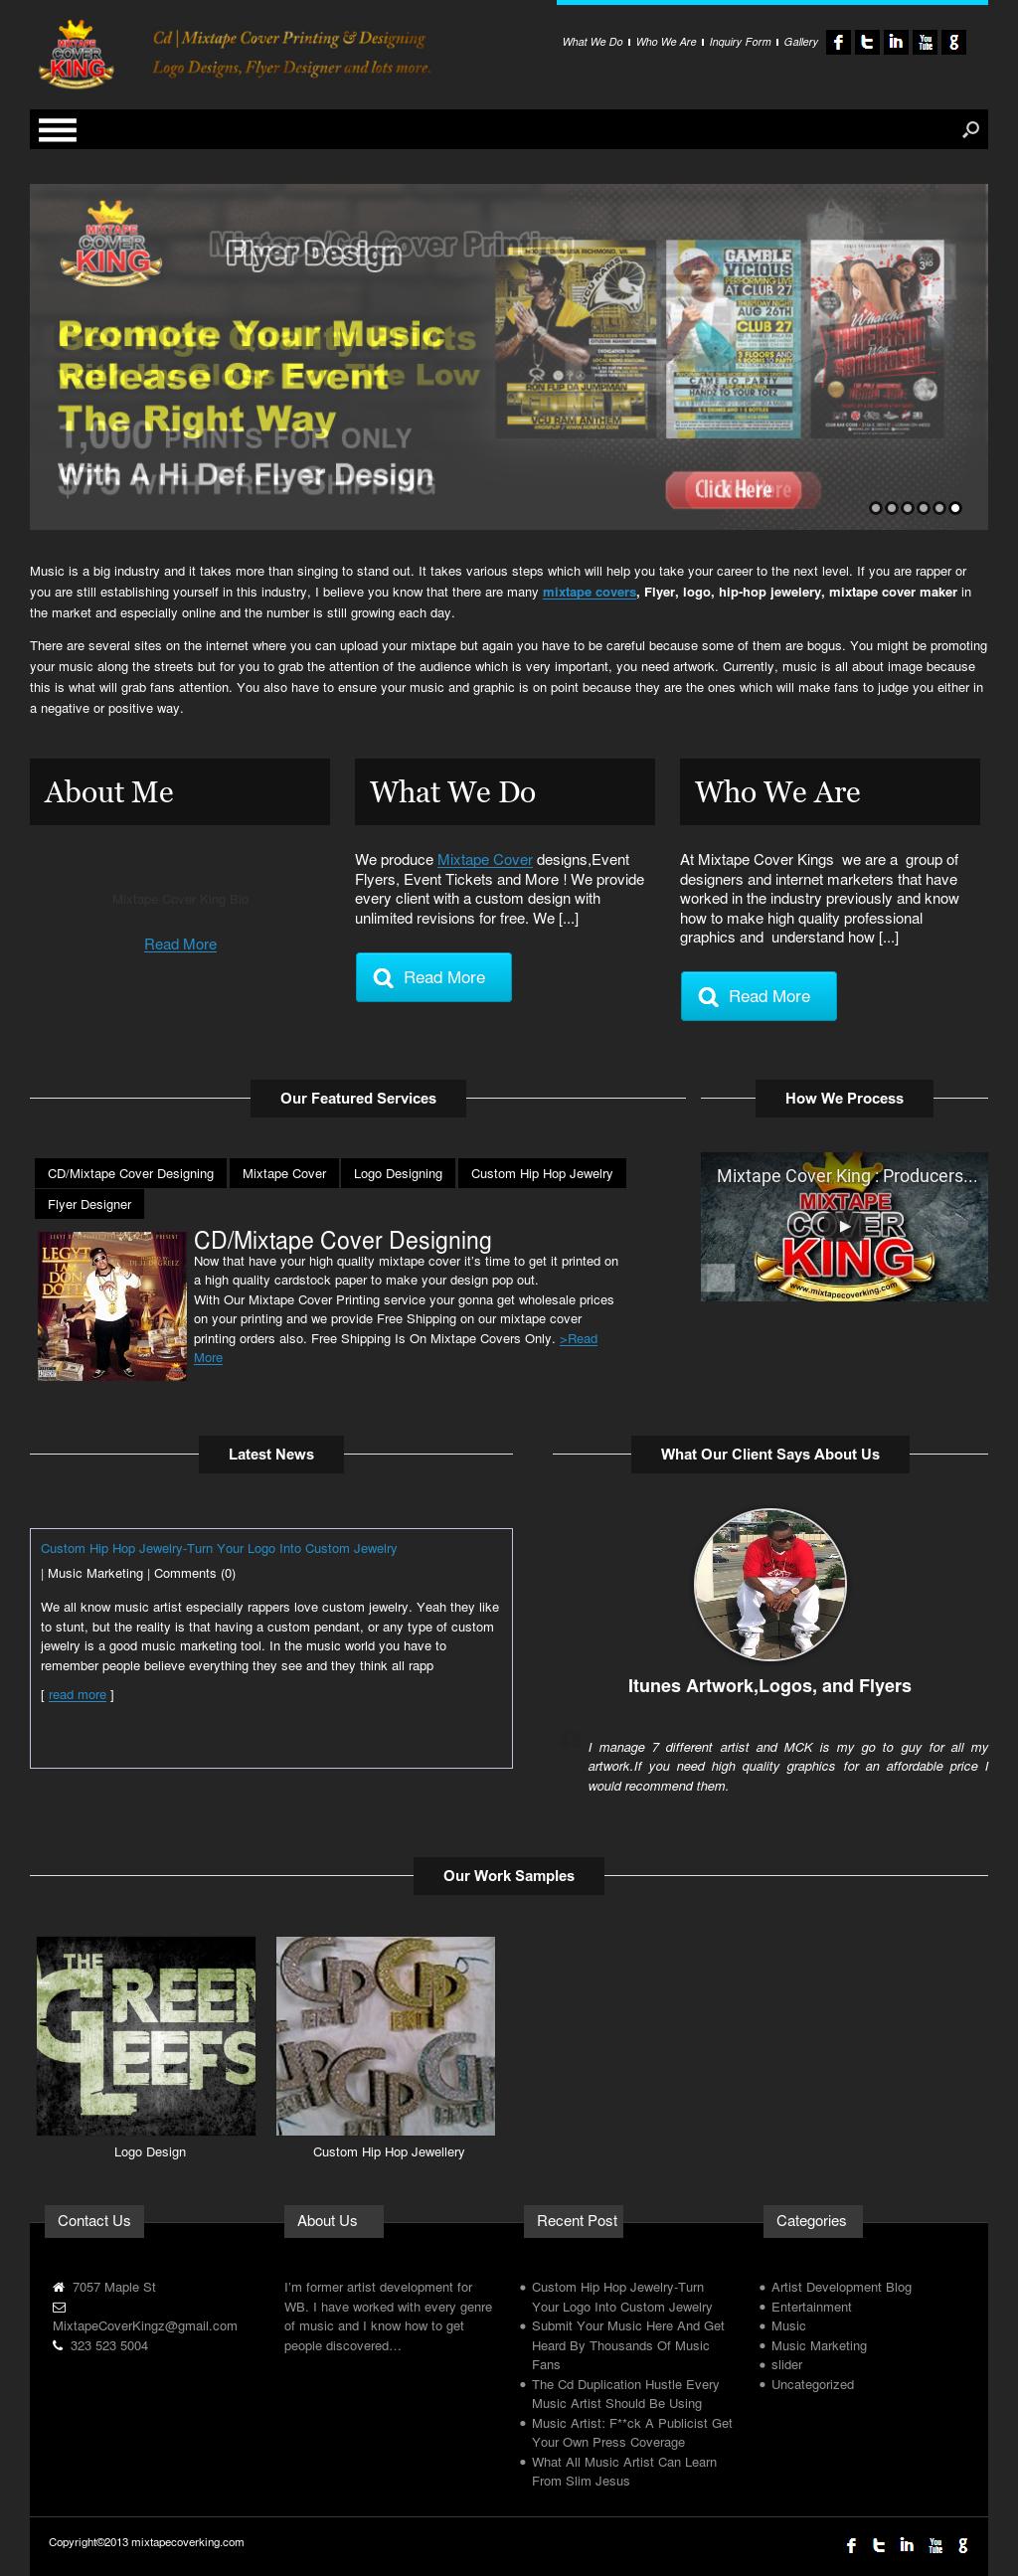 Mixtape Covers Logo Design Graphic Design Mixtape Cover Design Competitors Revenue And Employees Owler Company Profile